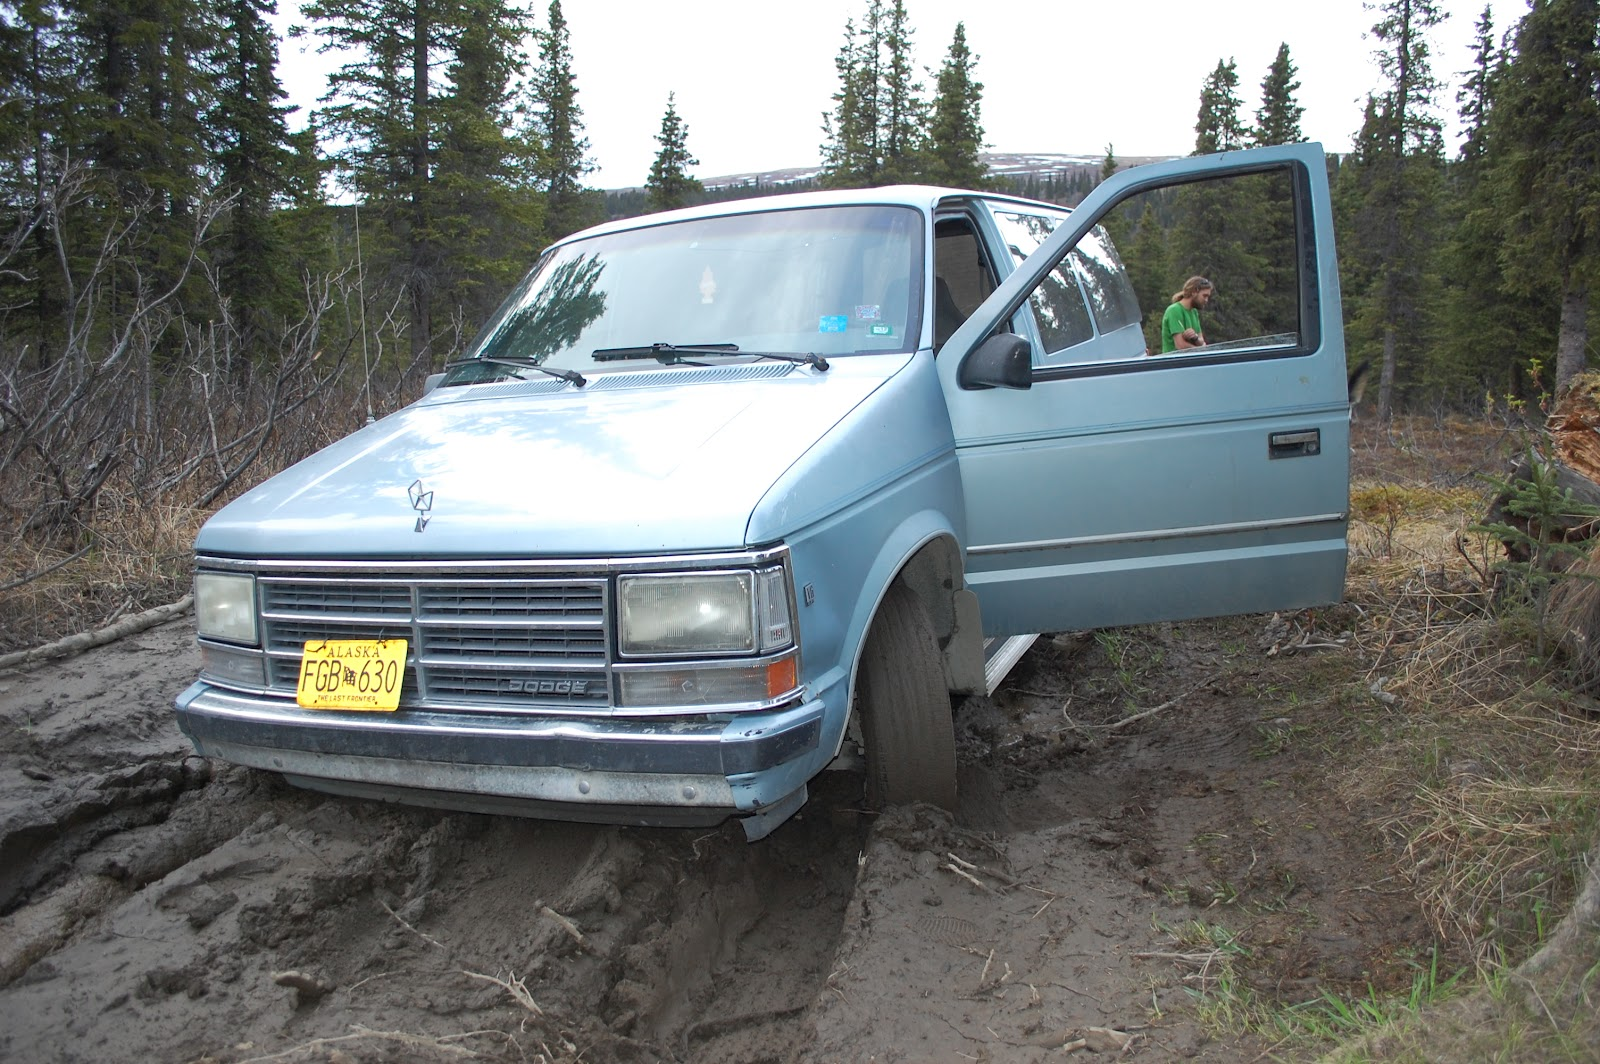 Caravan - Stuck in a Hole